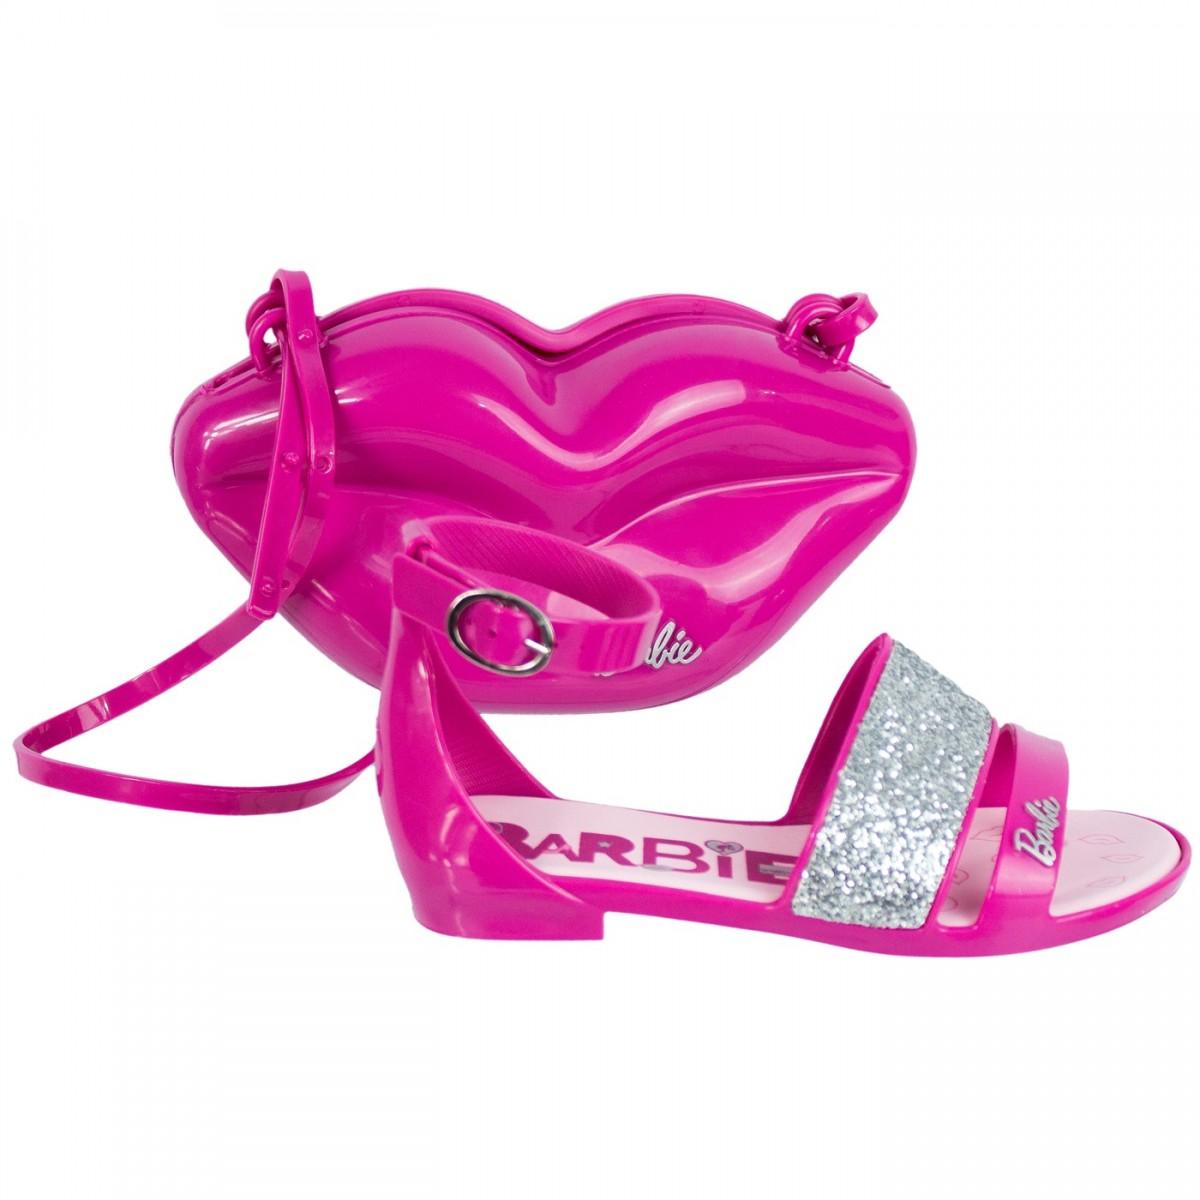 cce4c5461 Bizz Store - Sandália Infantil Grendene Barbie Pop Glan C/ Bolsa